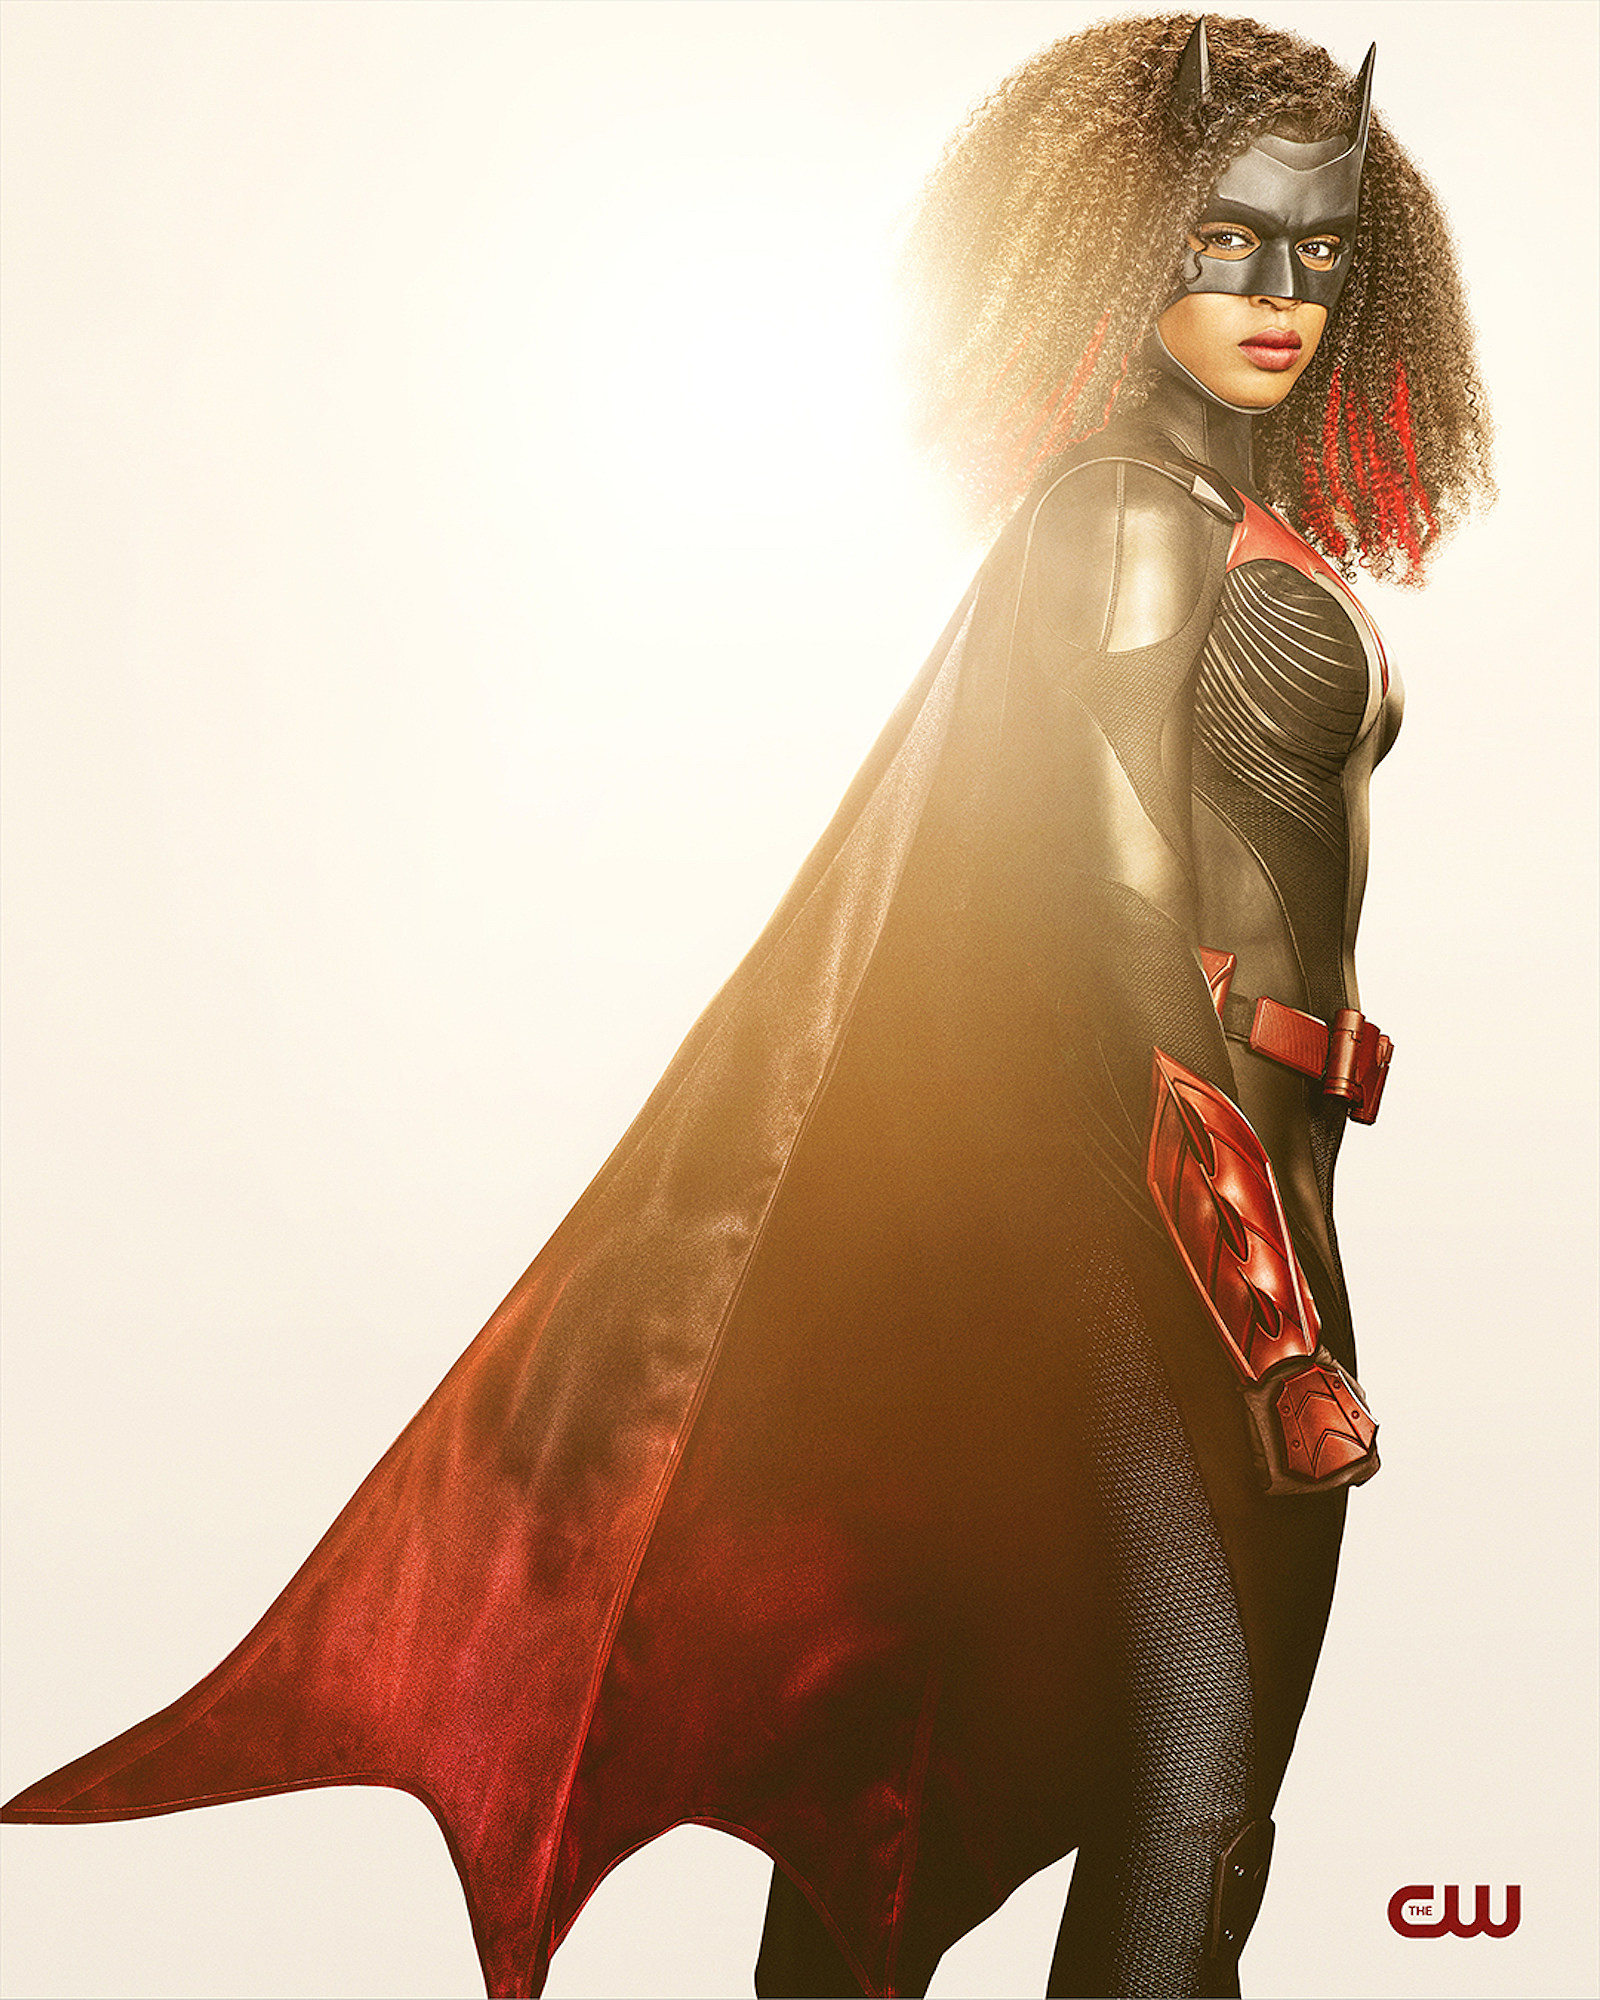 Batwoman's Javicia Leslie looks stunning in her new superhero costume 13